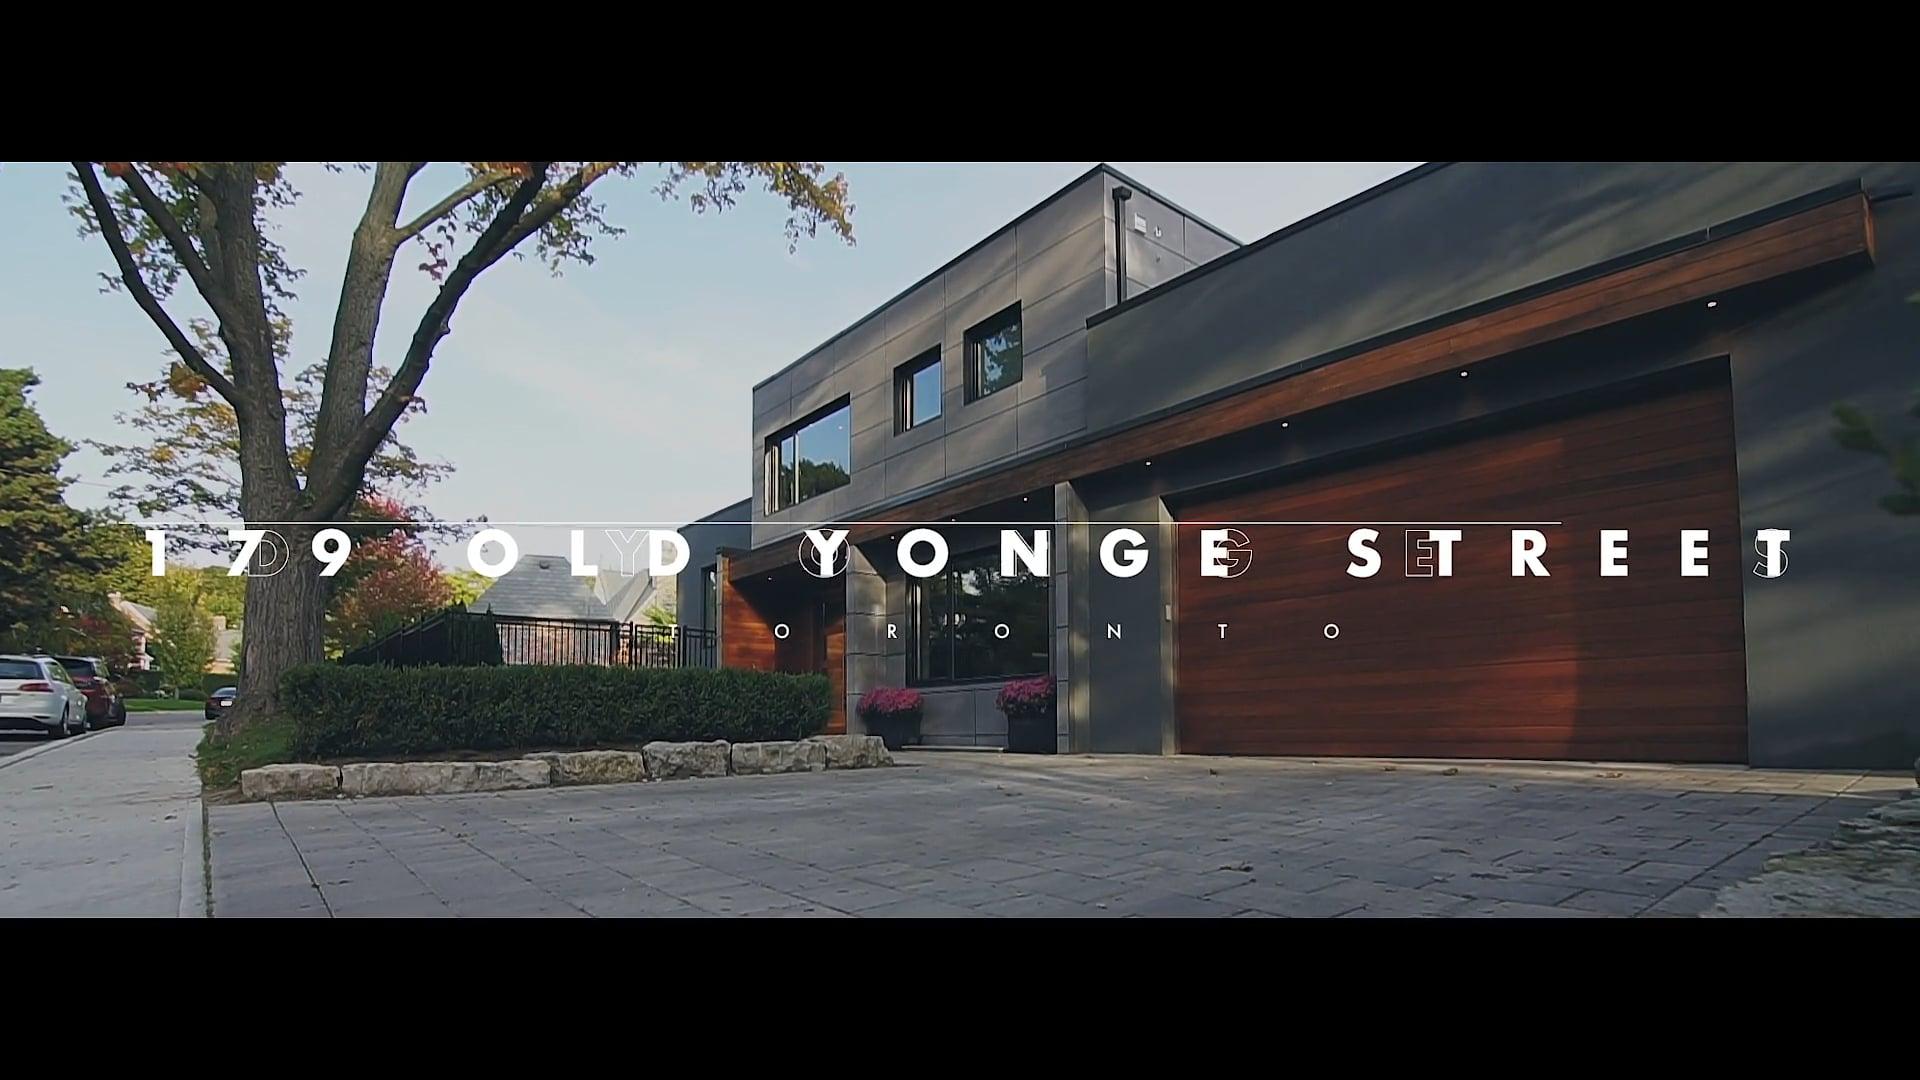 179 Old Yonge Street